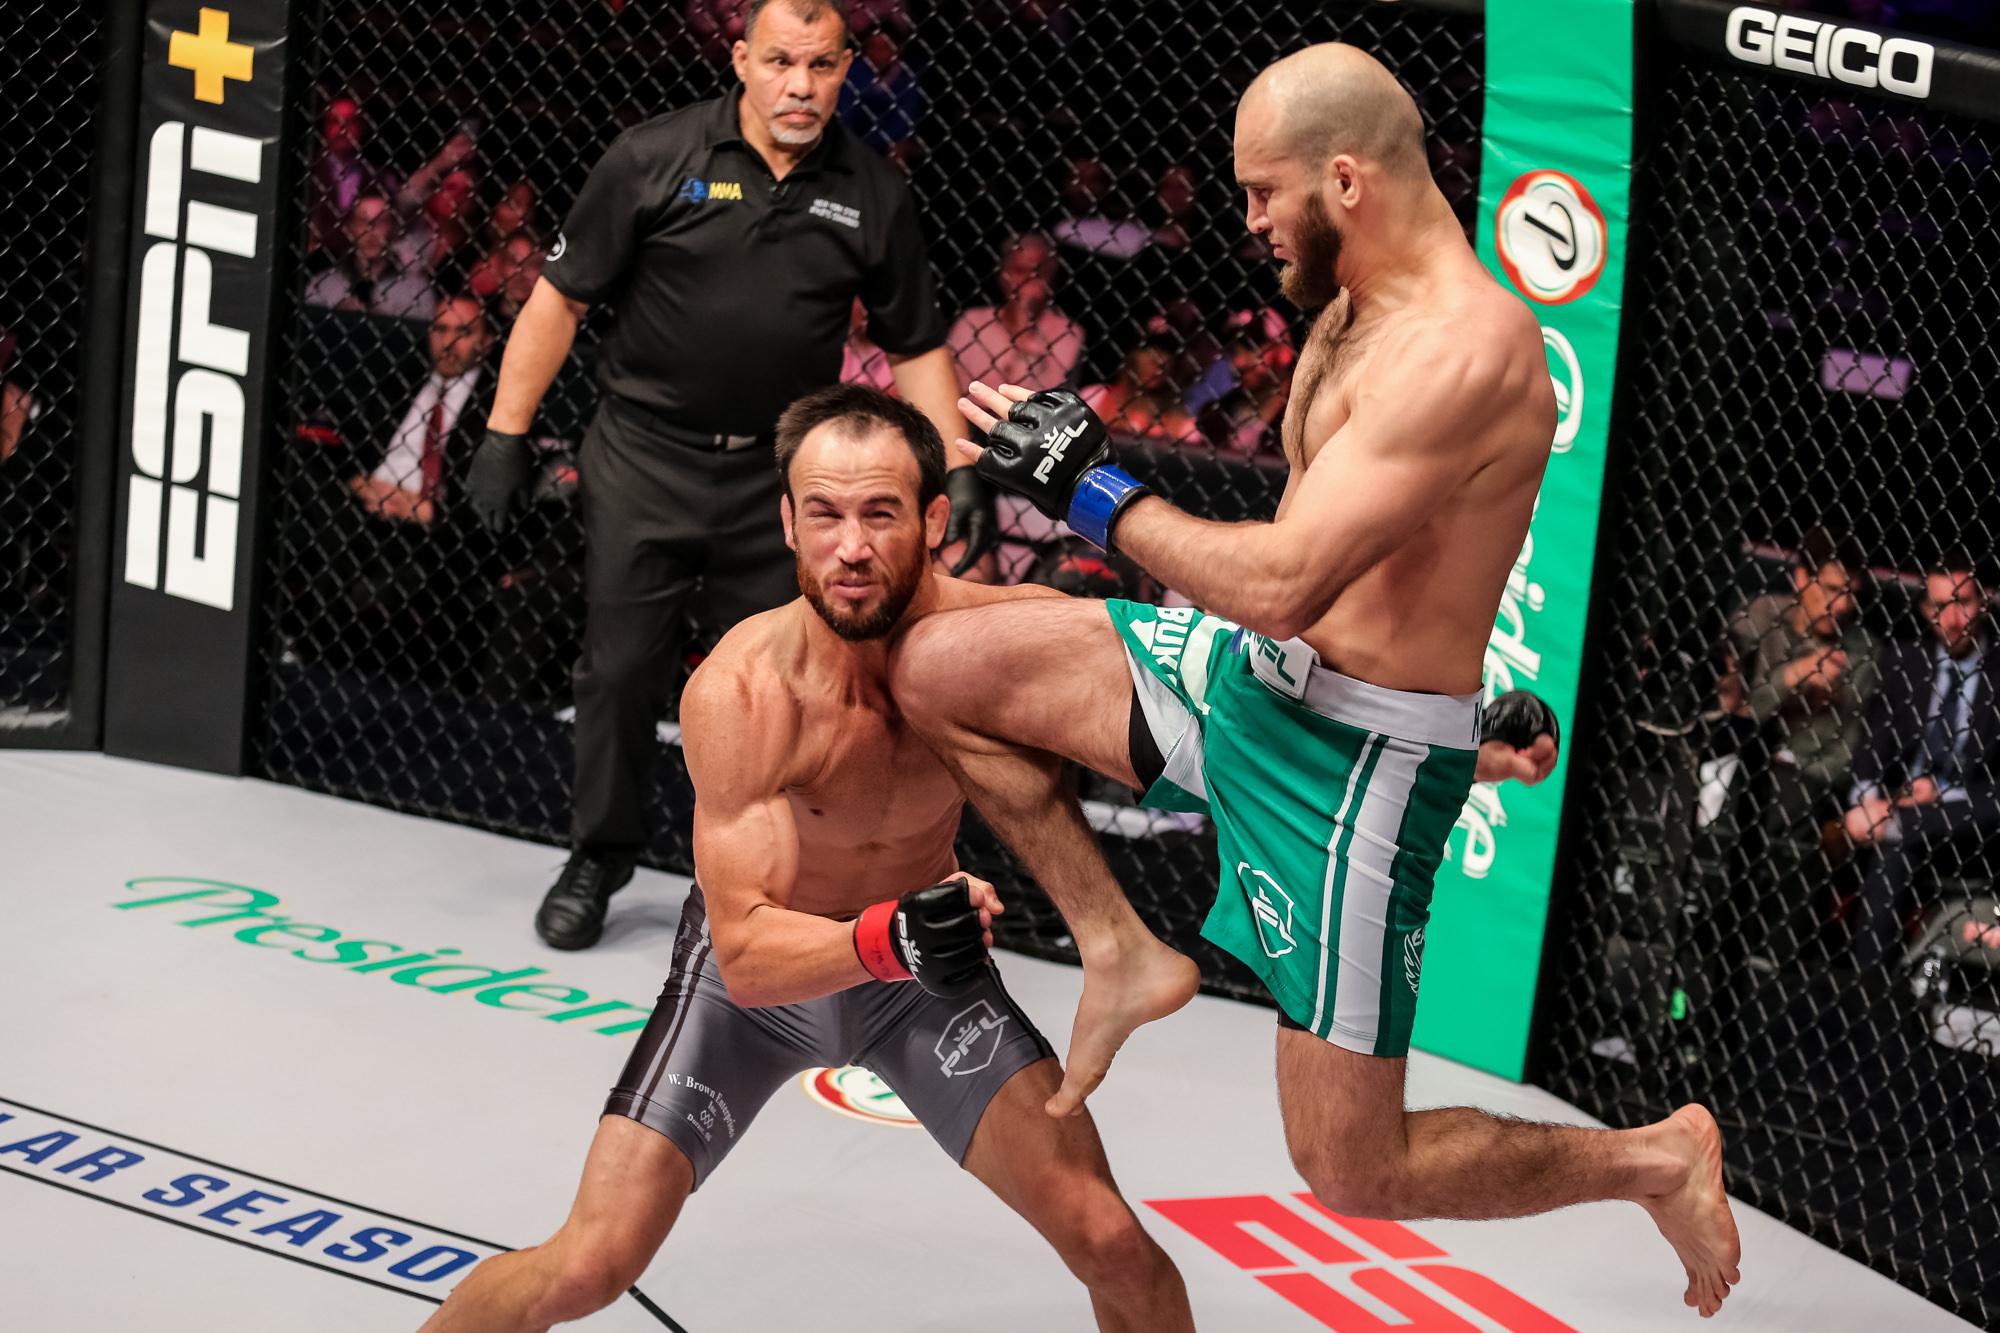 Movlid Khaybulaev KO's Damon Jackson with a vicious flying knee at PFL 2 (Video)